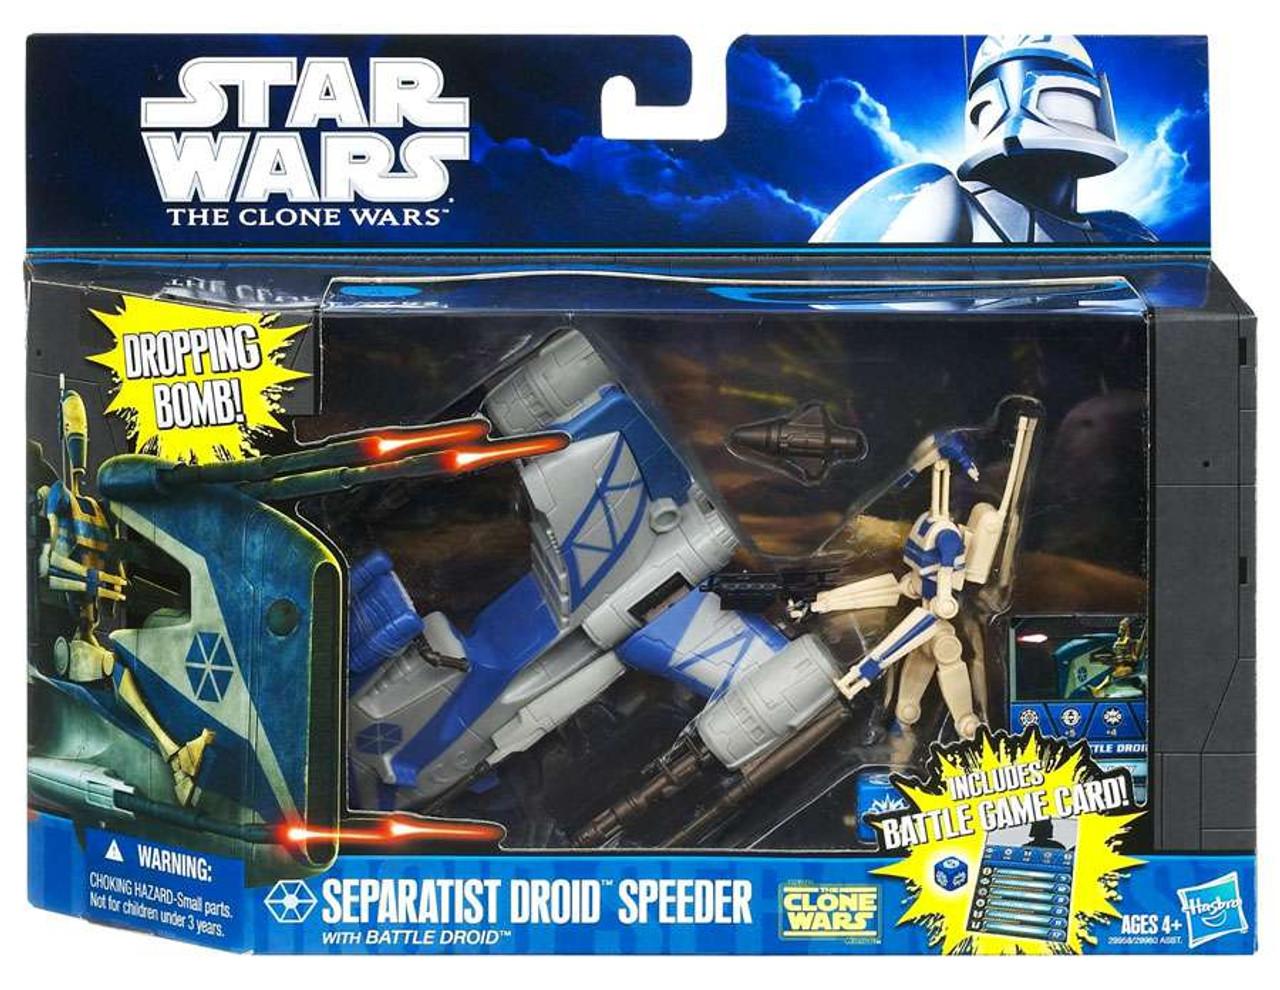 Star Wars The Clone Wars Separatist Droid Speeder with Battle Droid Vehicle & Action Figure